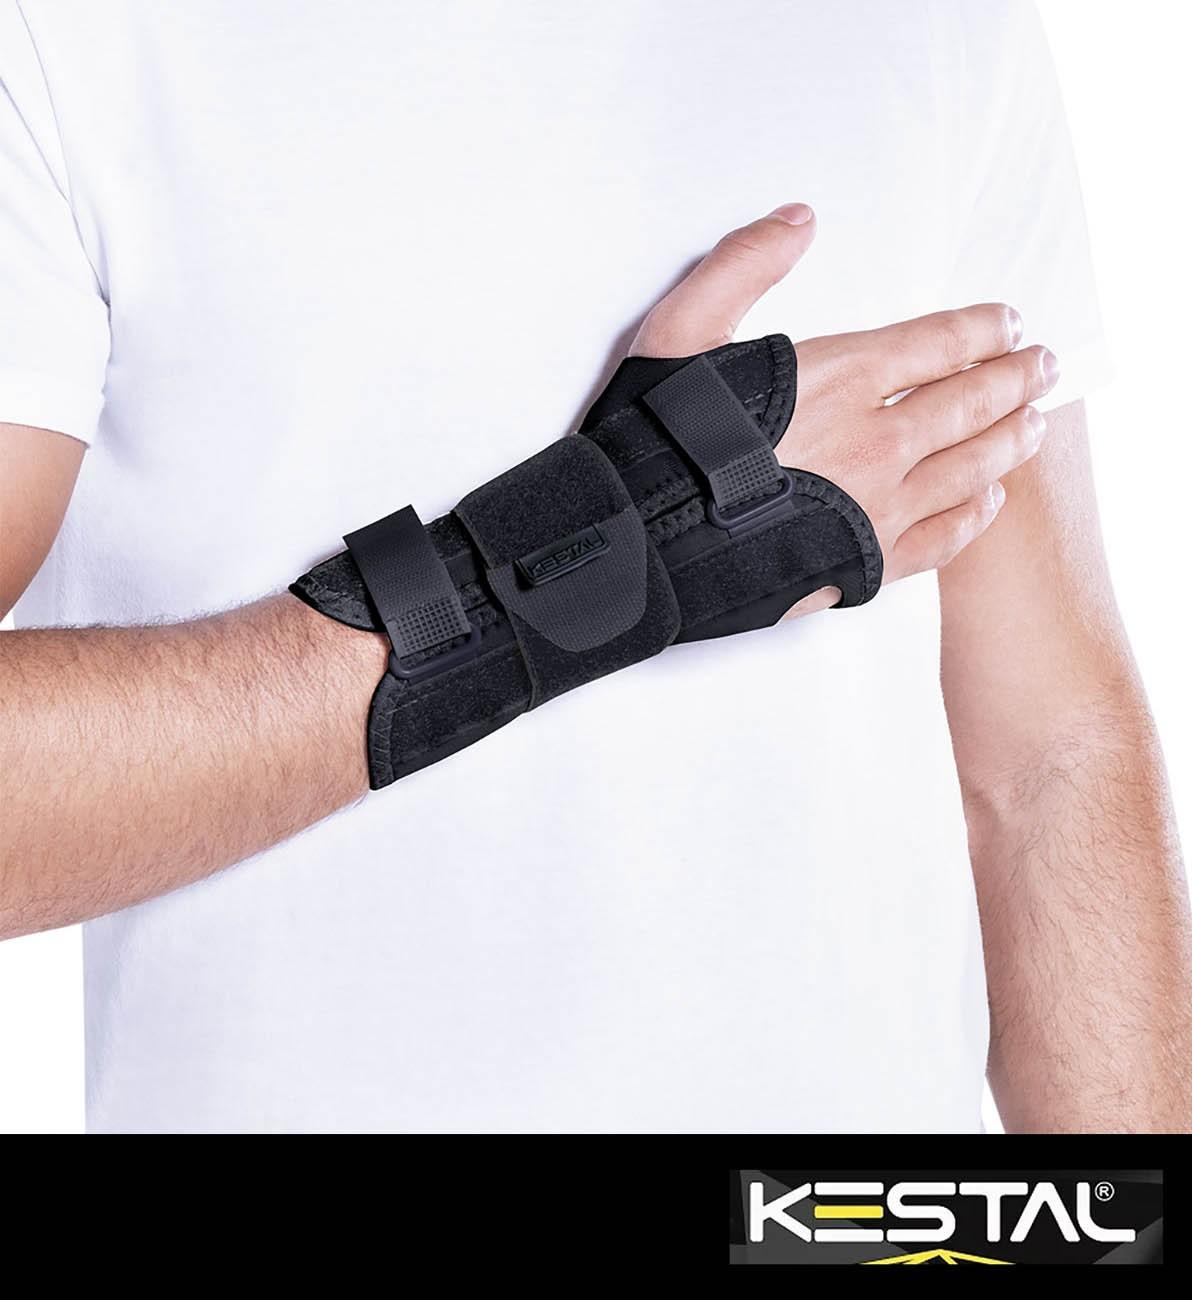 Munhequeira Com Tala e 3 Tiras Bilateral (KSN031) - Kestal